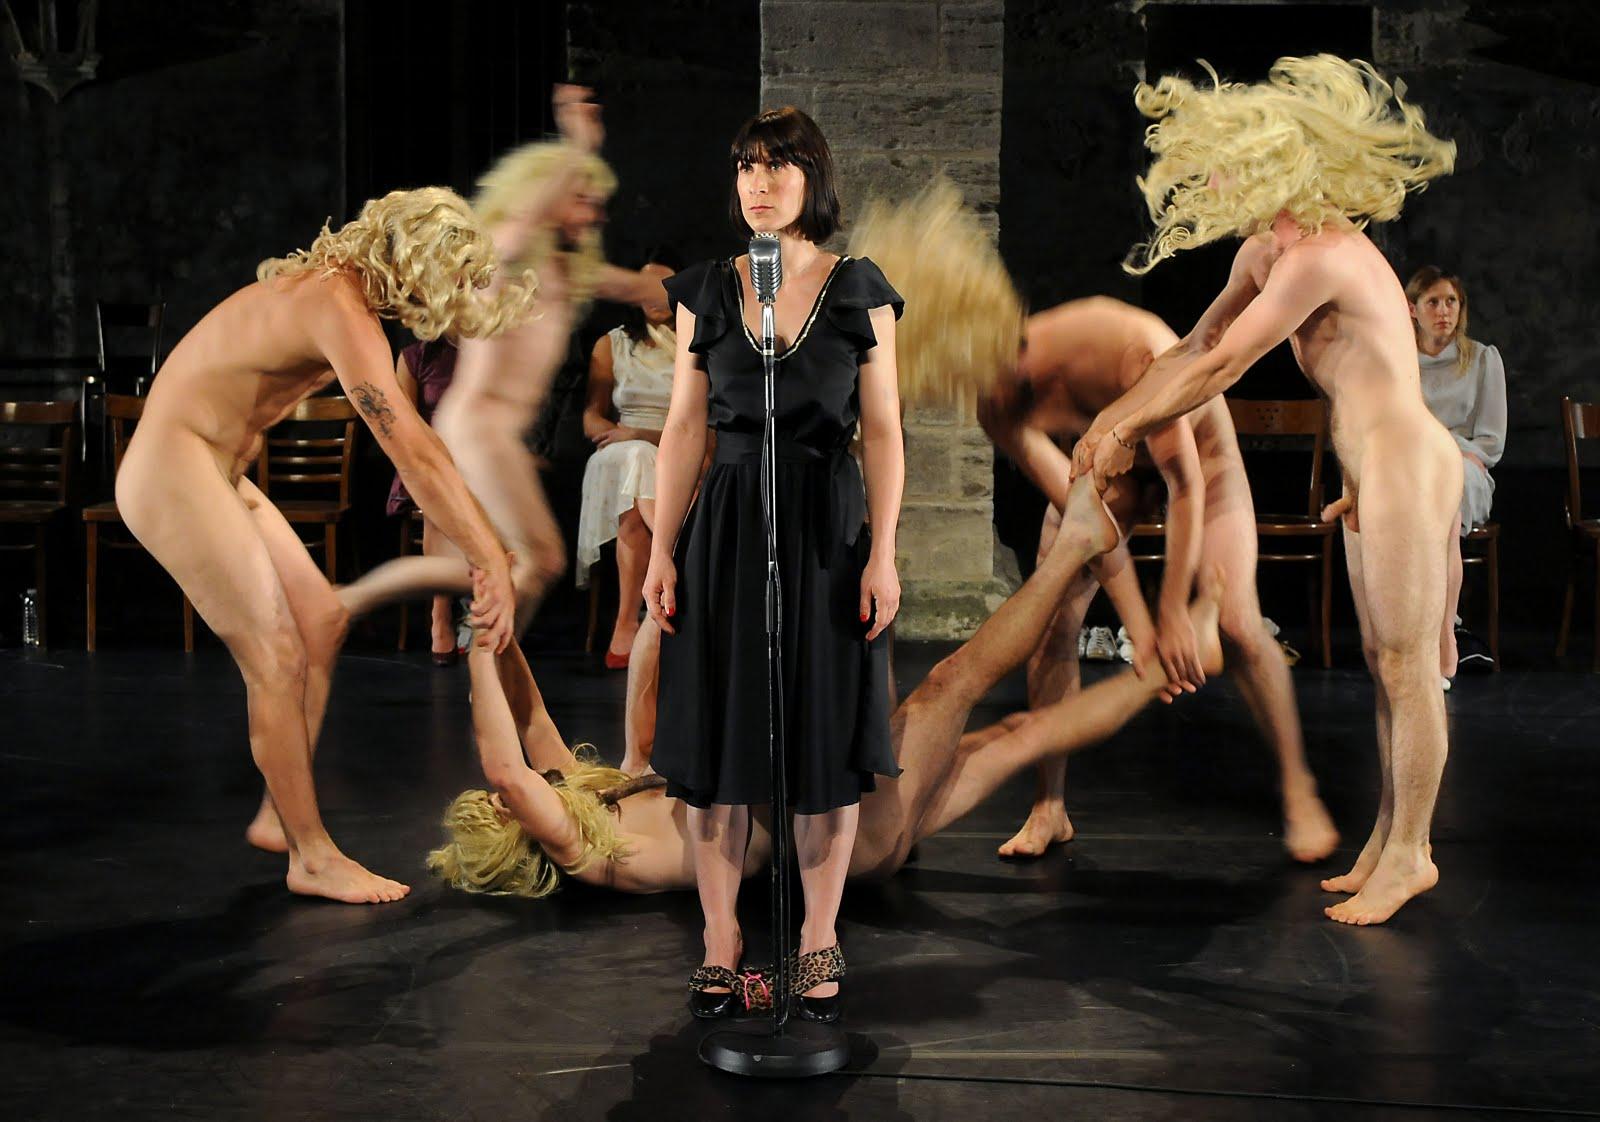 eroticheskiy-teatr-tv-onlayn-smotret-pornuha-foto-tolstih-pisek